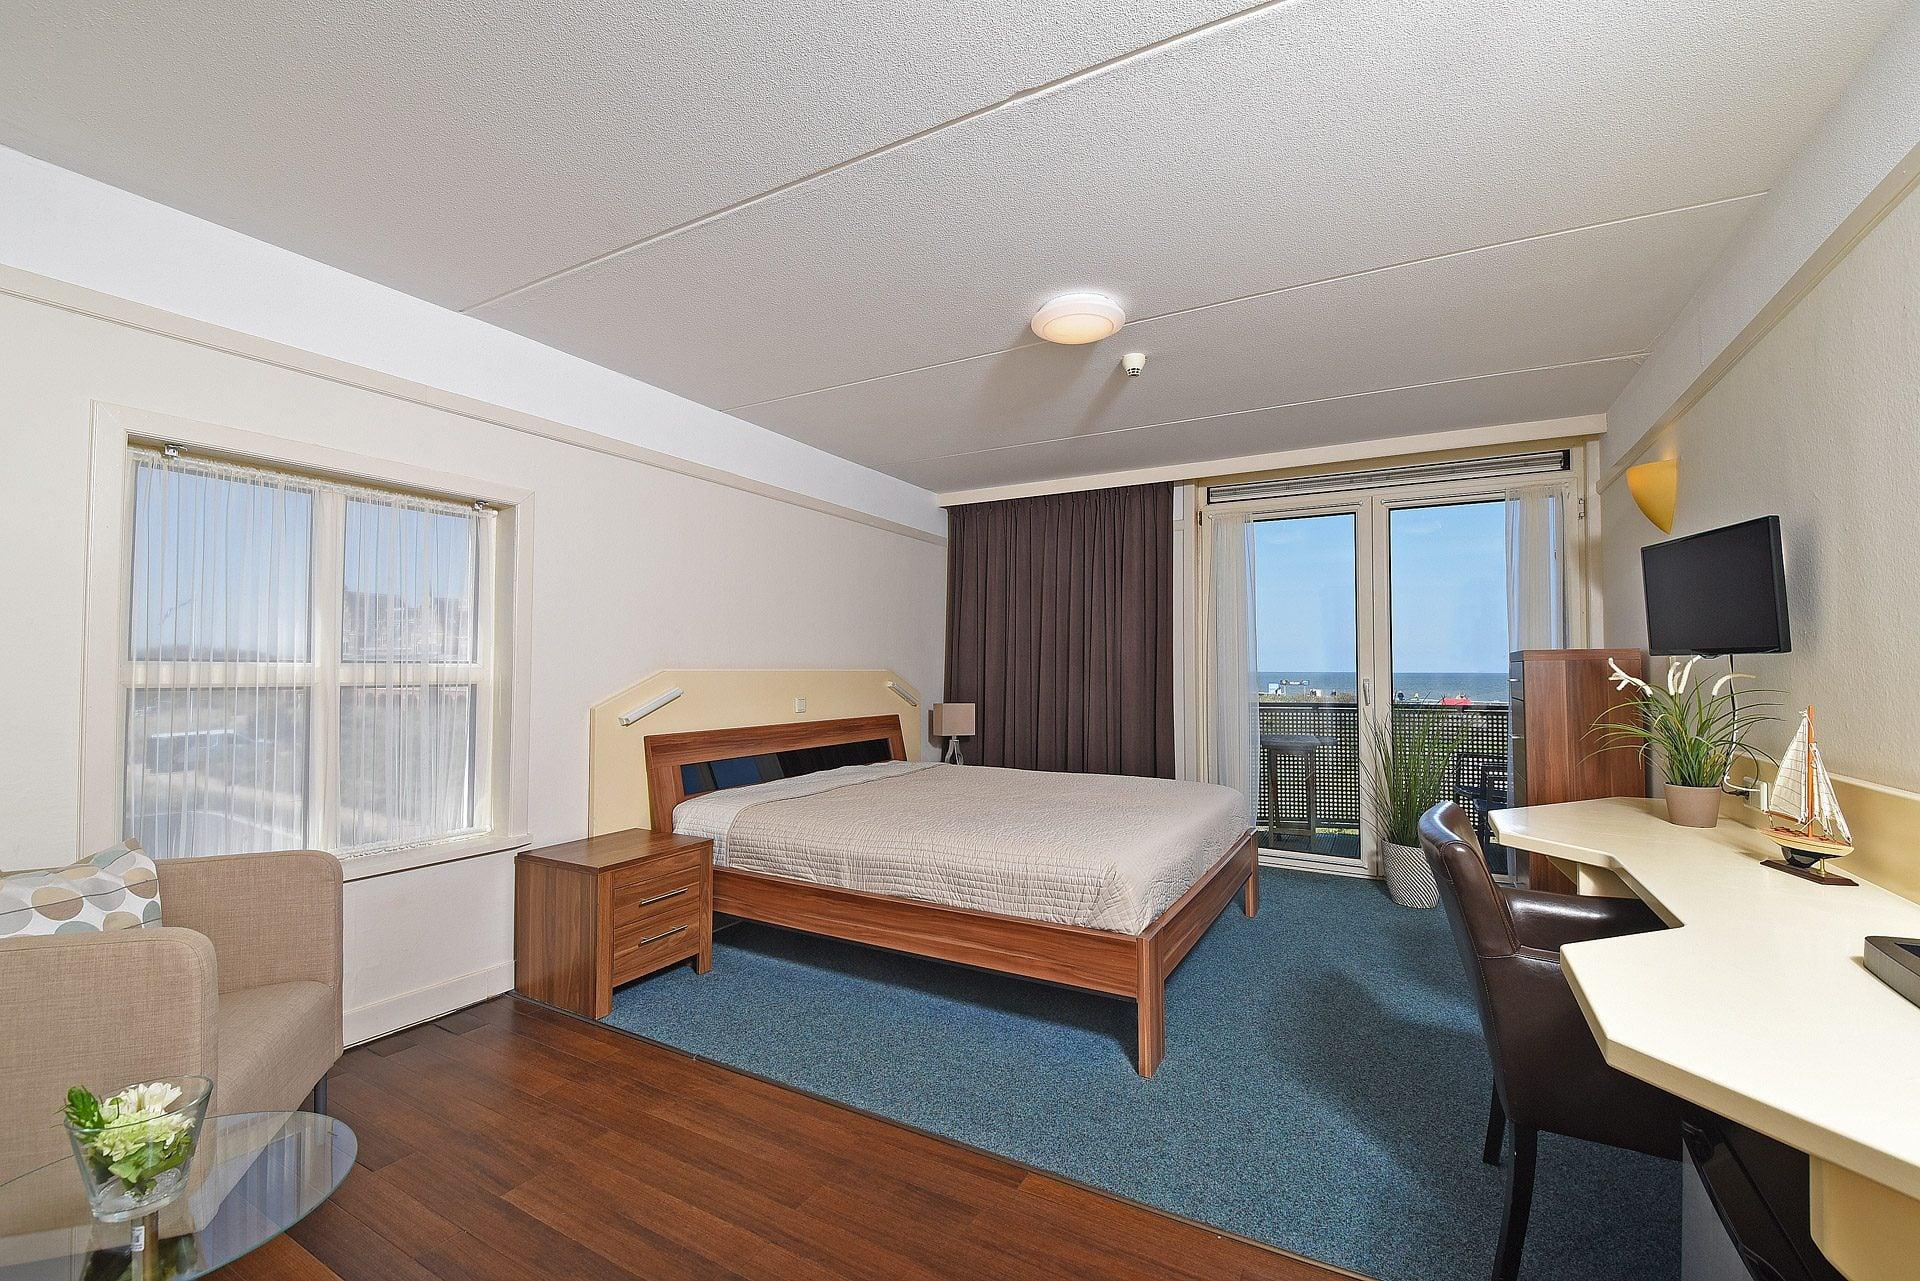 Zimmer - Hotel Nehalennia